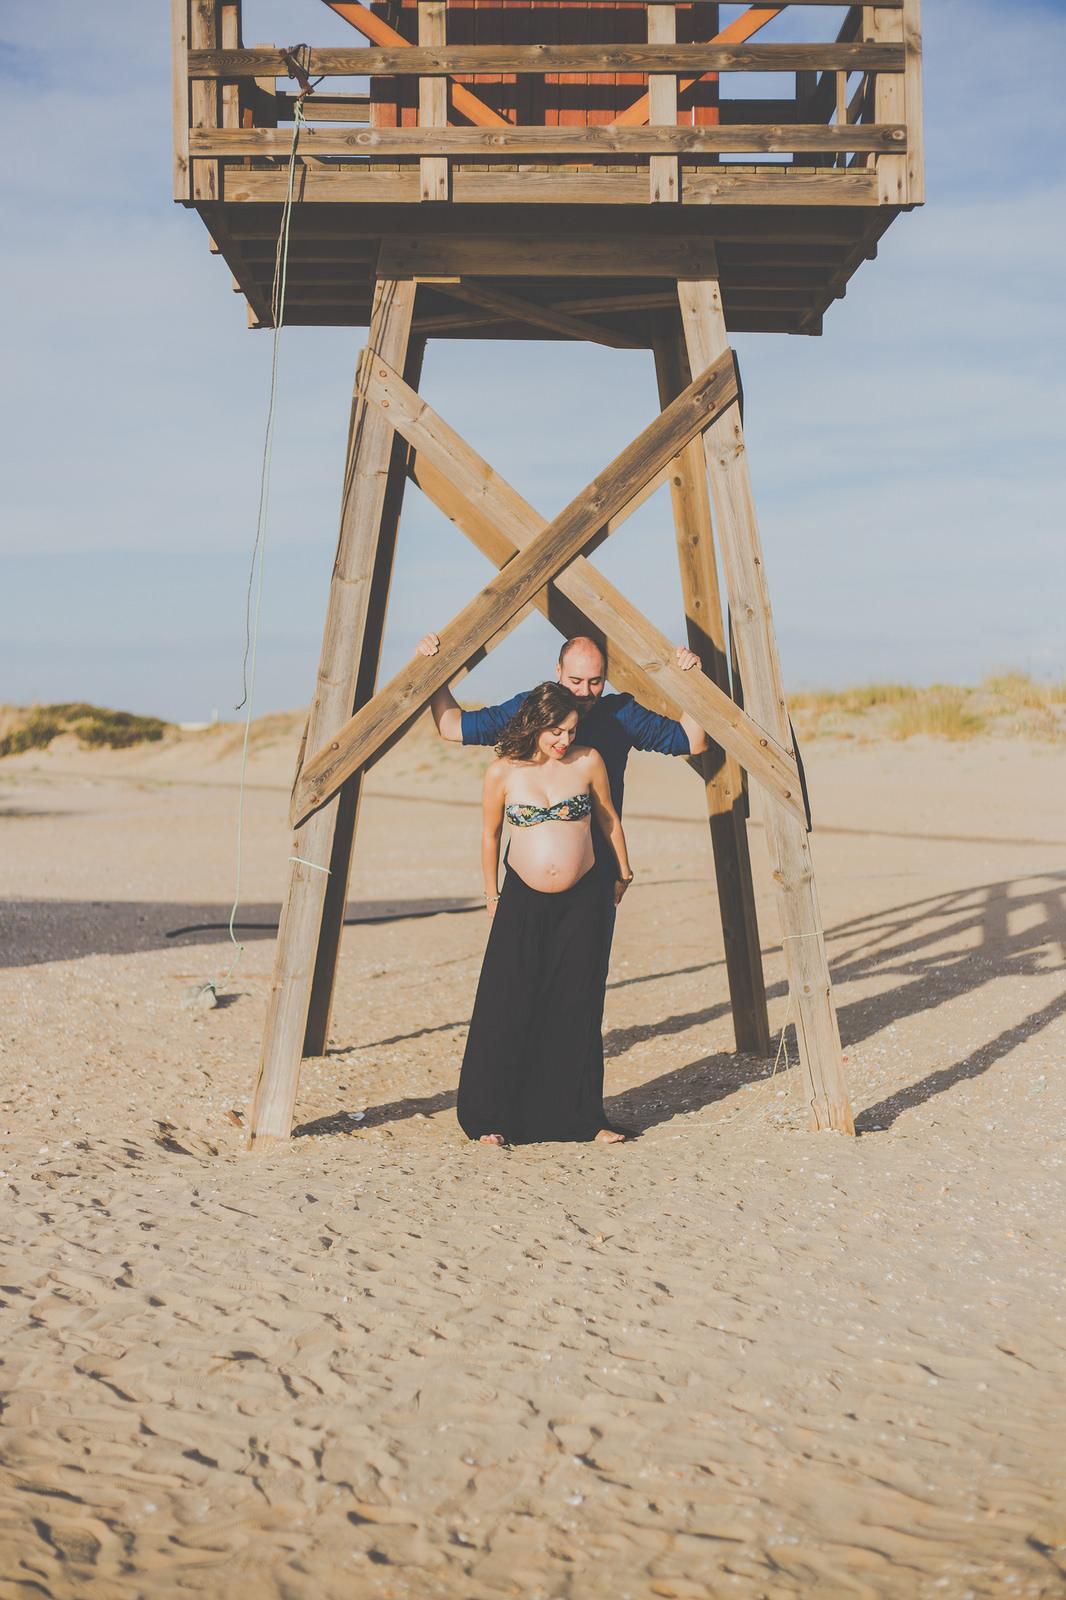 sesion embarazo silvia orduna fotografia huelva playa 19